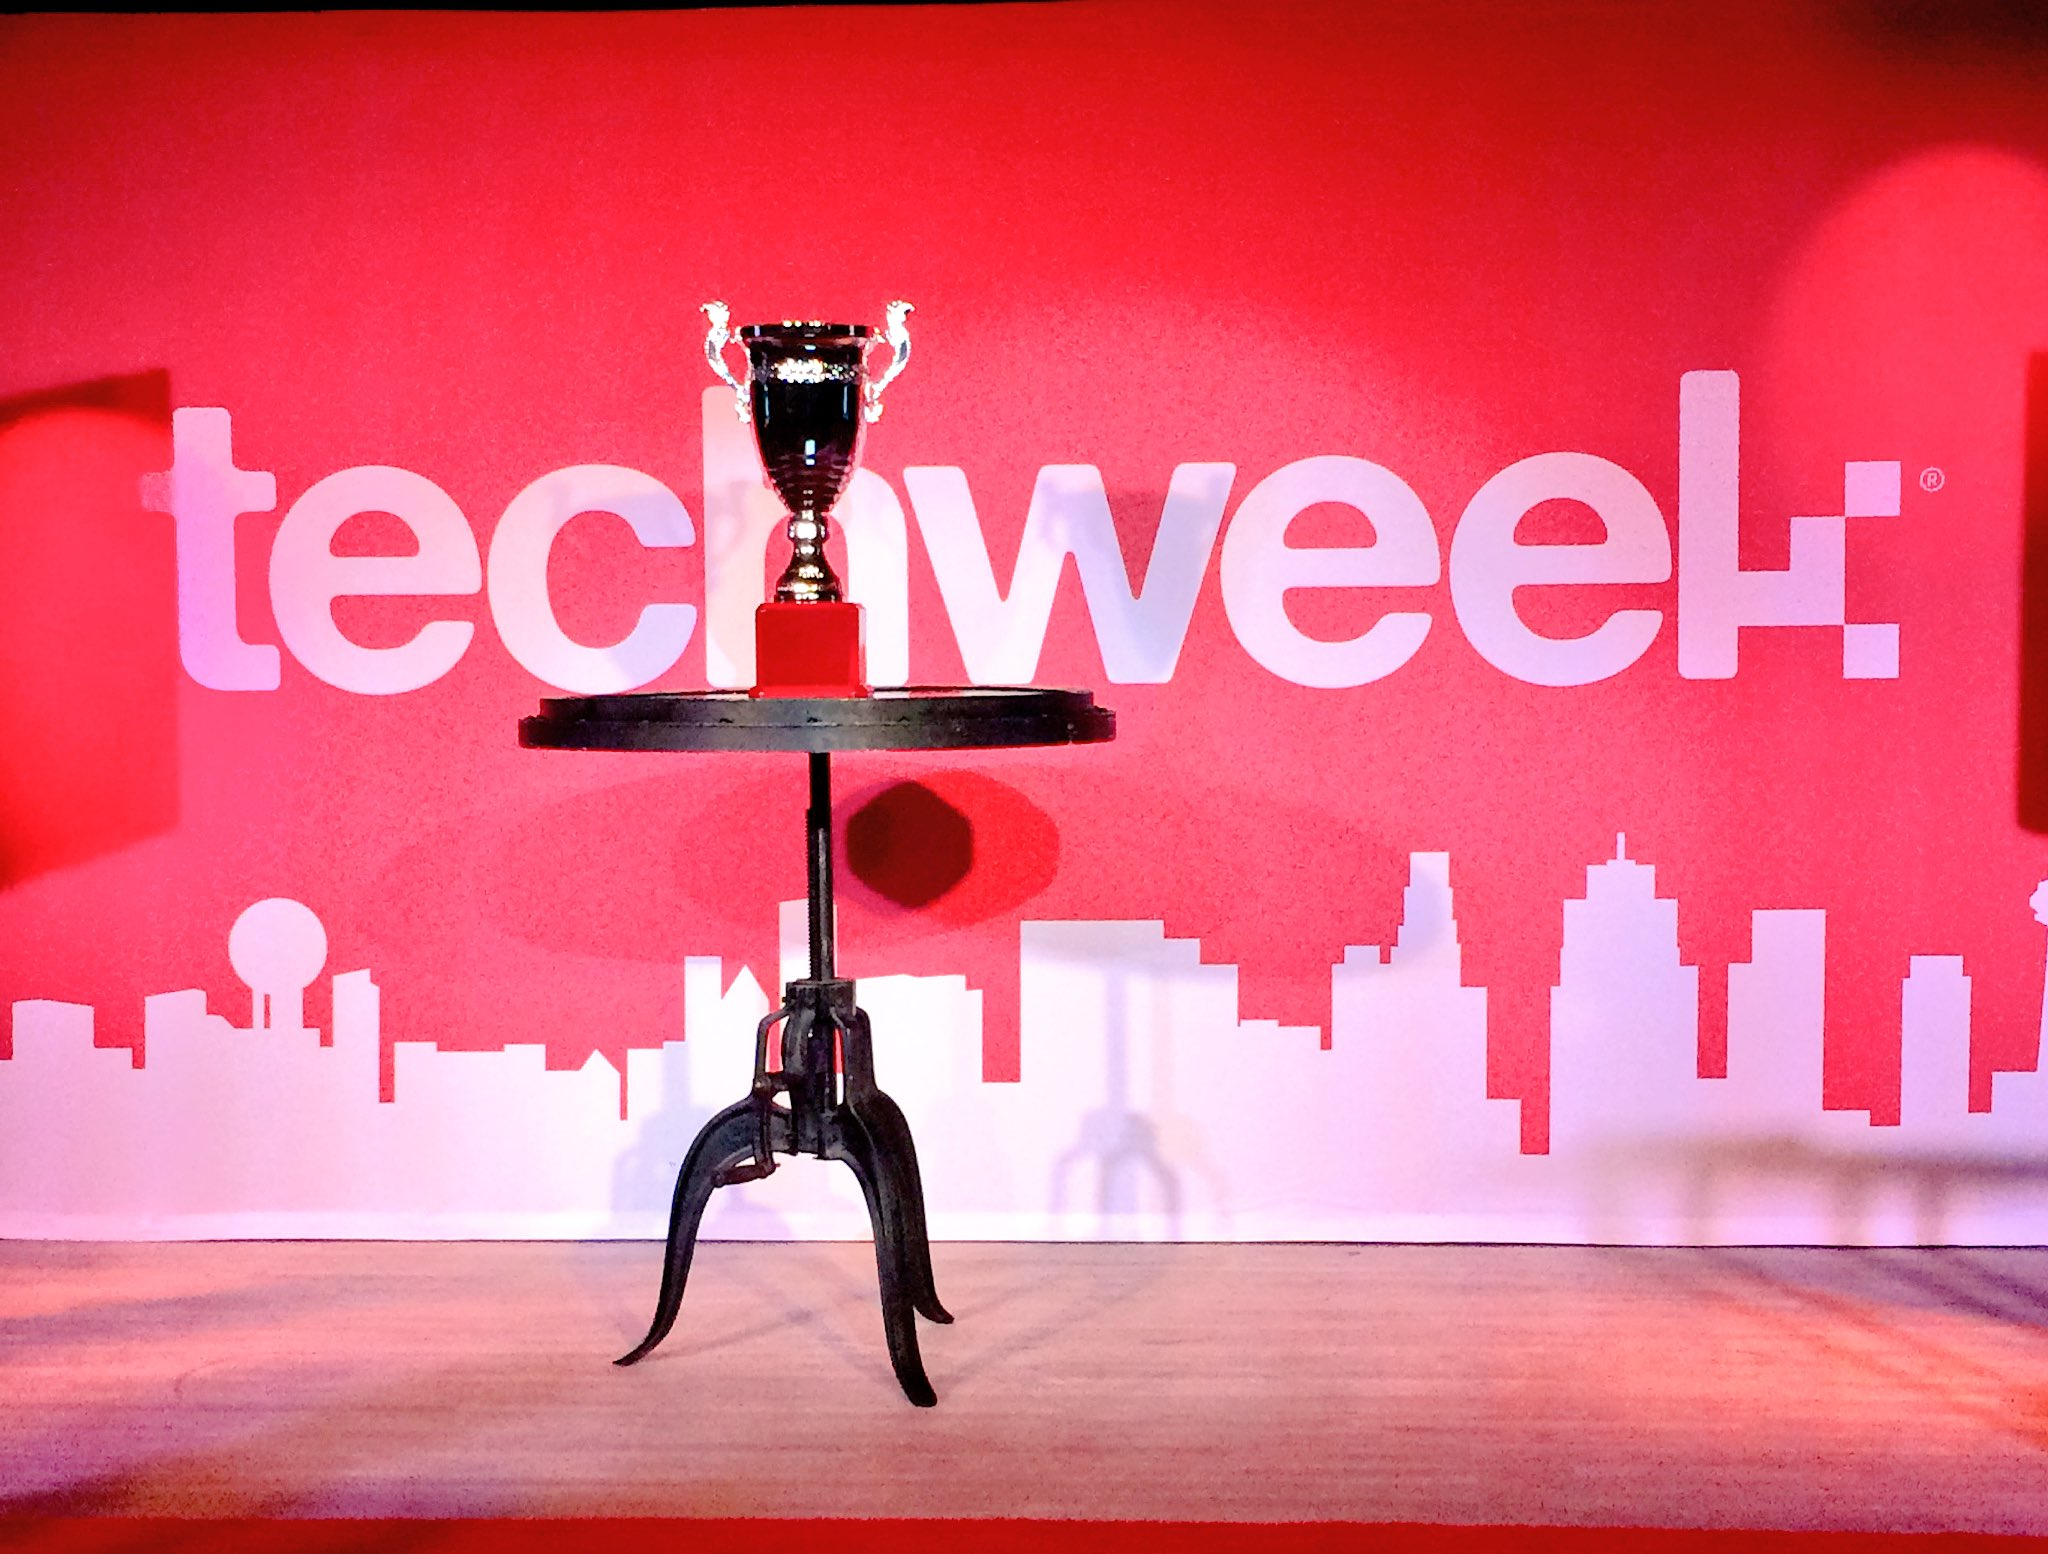 ParqEx Techweek